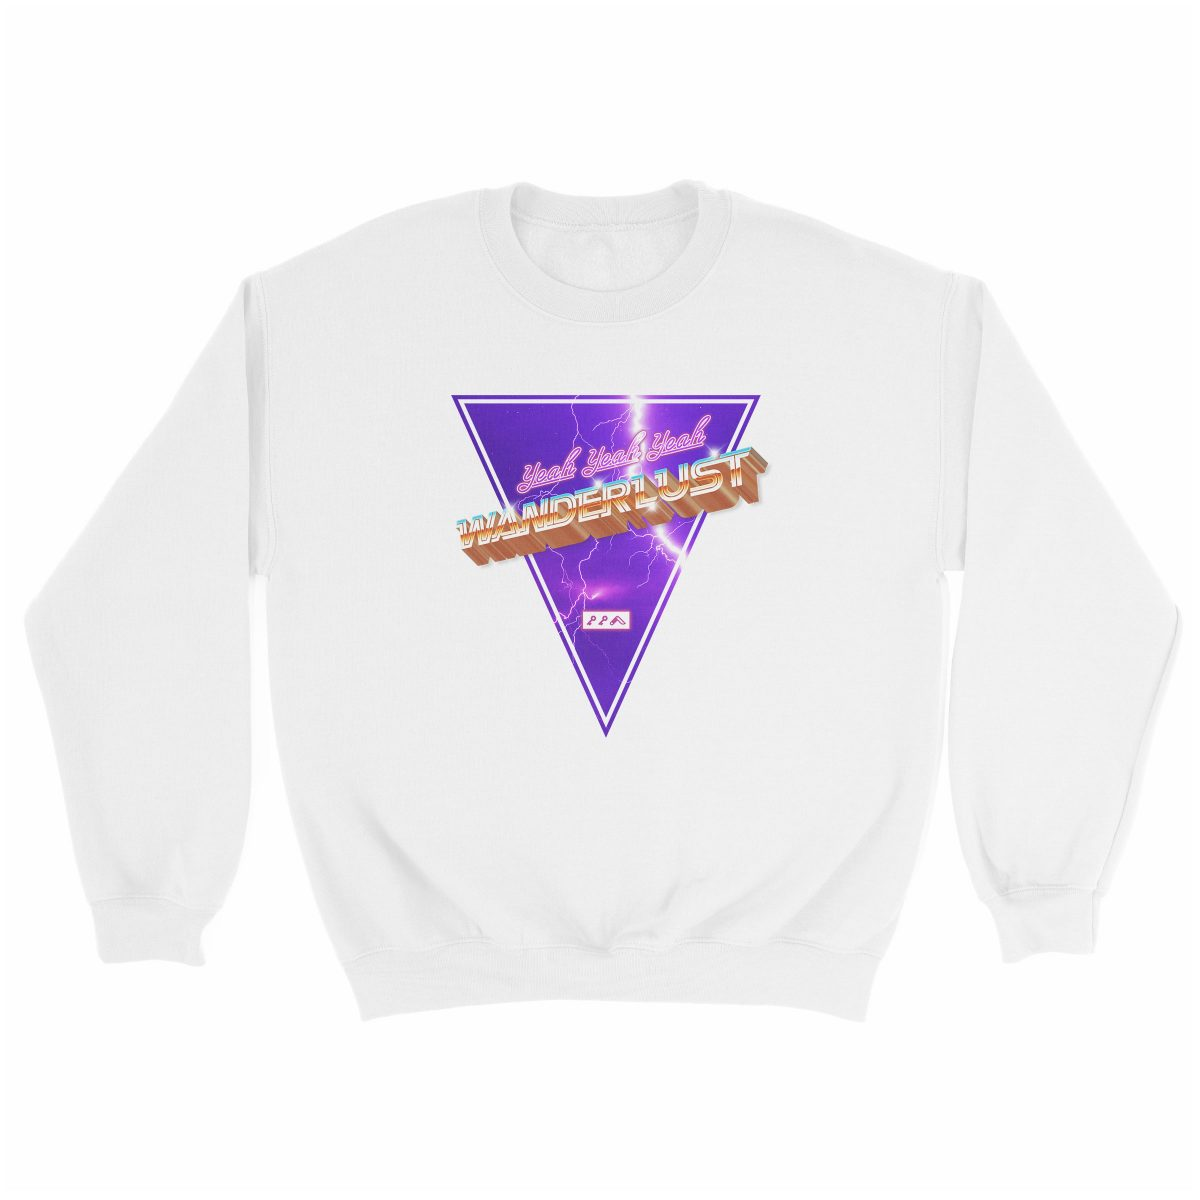 "(yeah yeah yeah) ""WANDERLUST"" music festival artist sweatshirt in white"